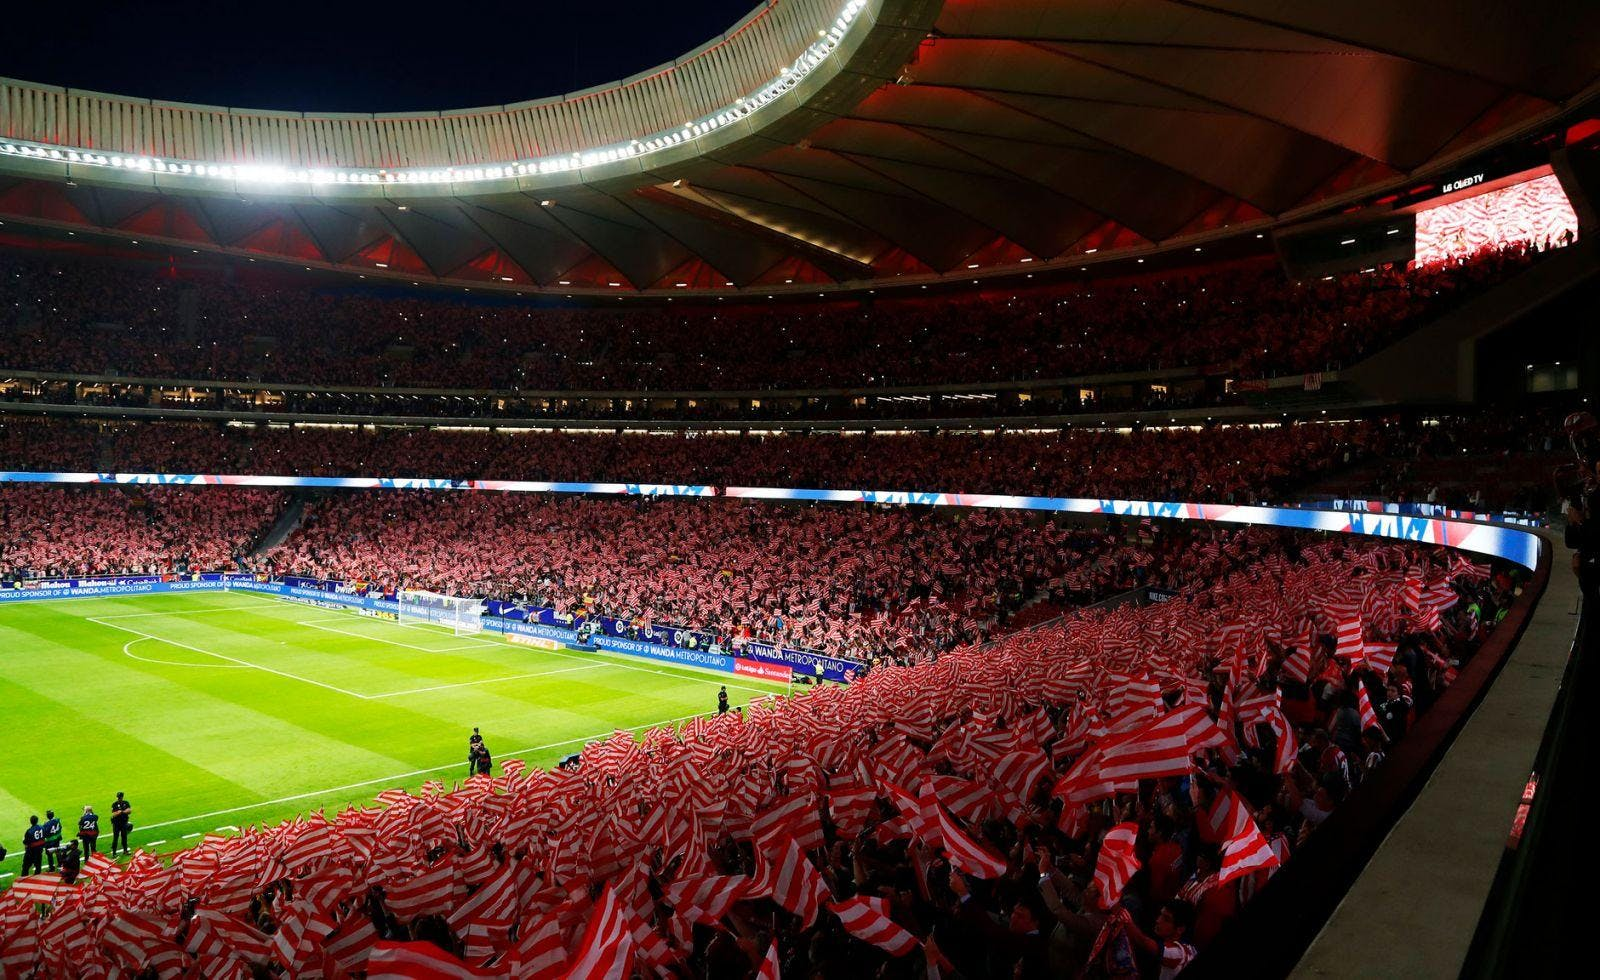 Club Atltico de Madrid v Villarreal CF - VIP Hospitality Tickets